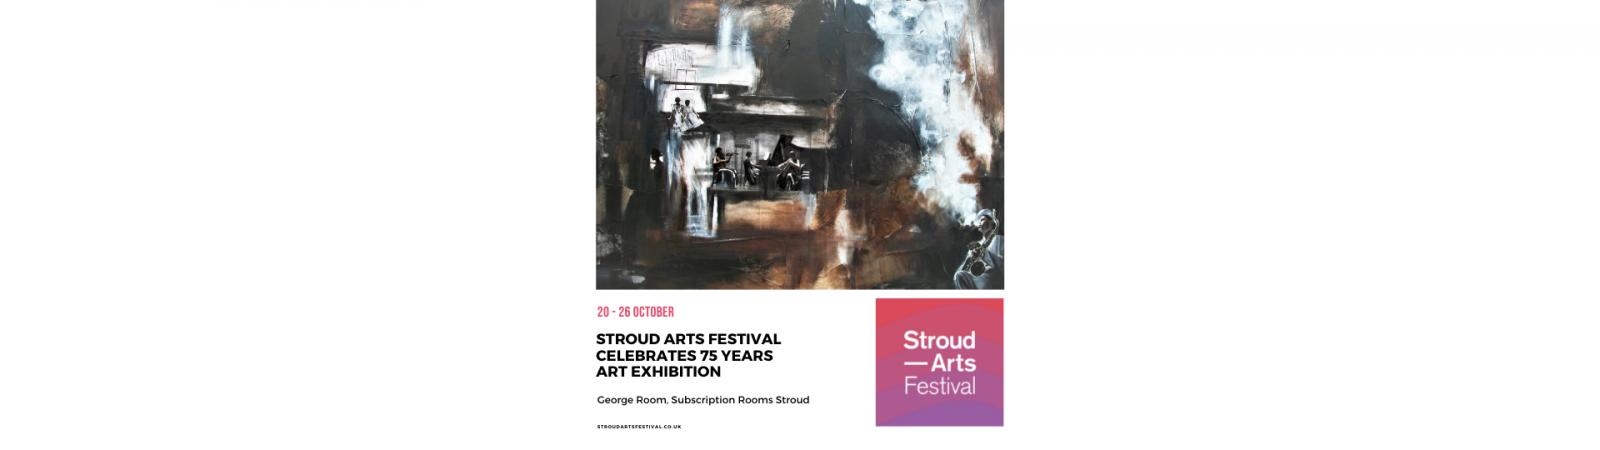 Stroud Arts Festival Celebrates 75 Years - Exhibition